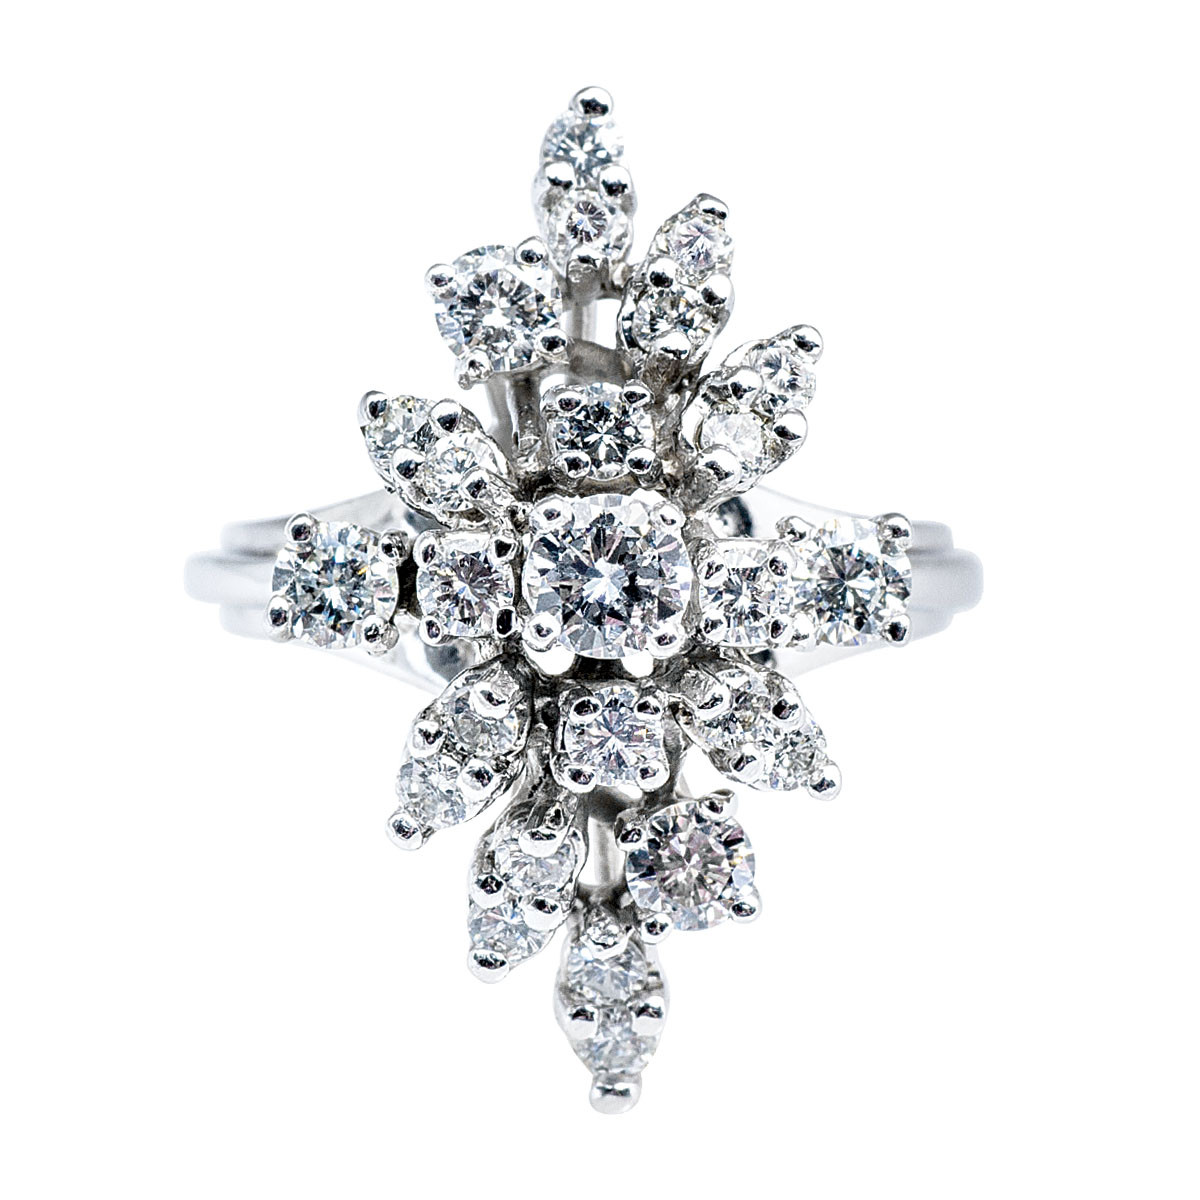 Vintage 1.00 CTW Diamond Cocktail Ring